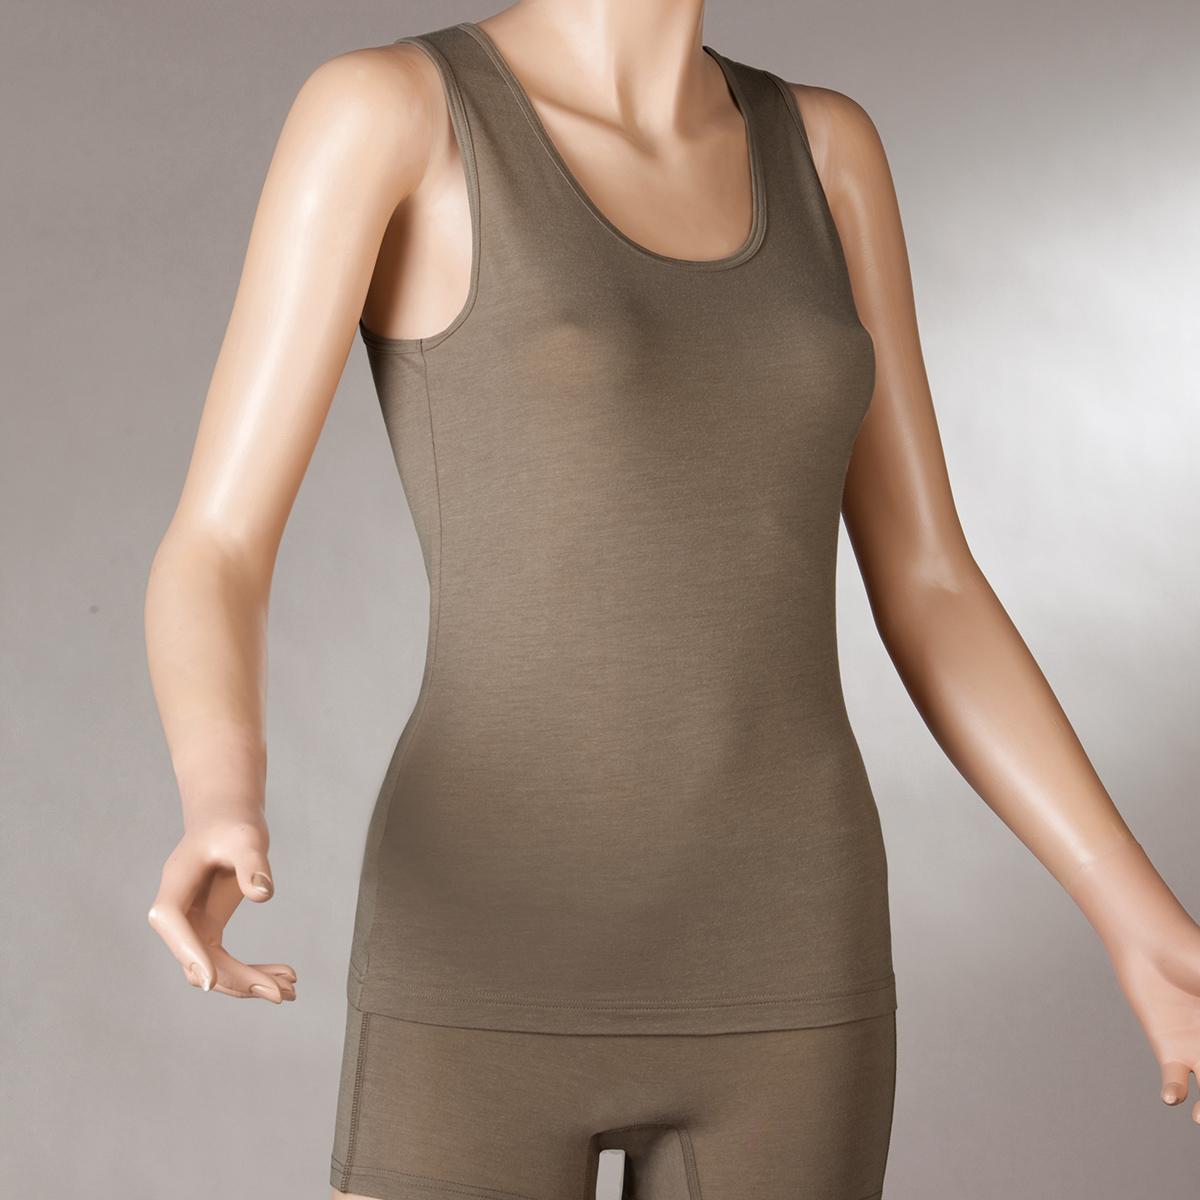 b.well Yoga Damen Long-Top - Karl Rieker-Shop